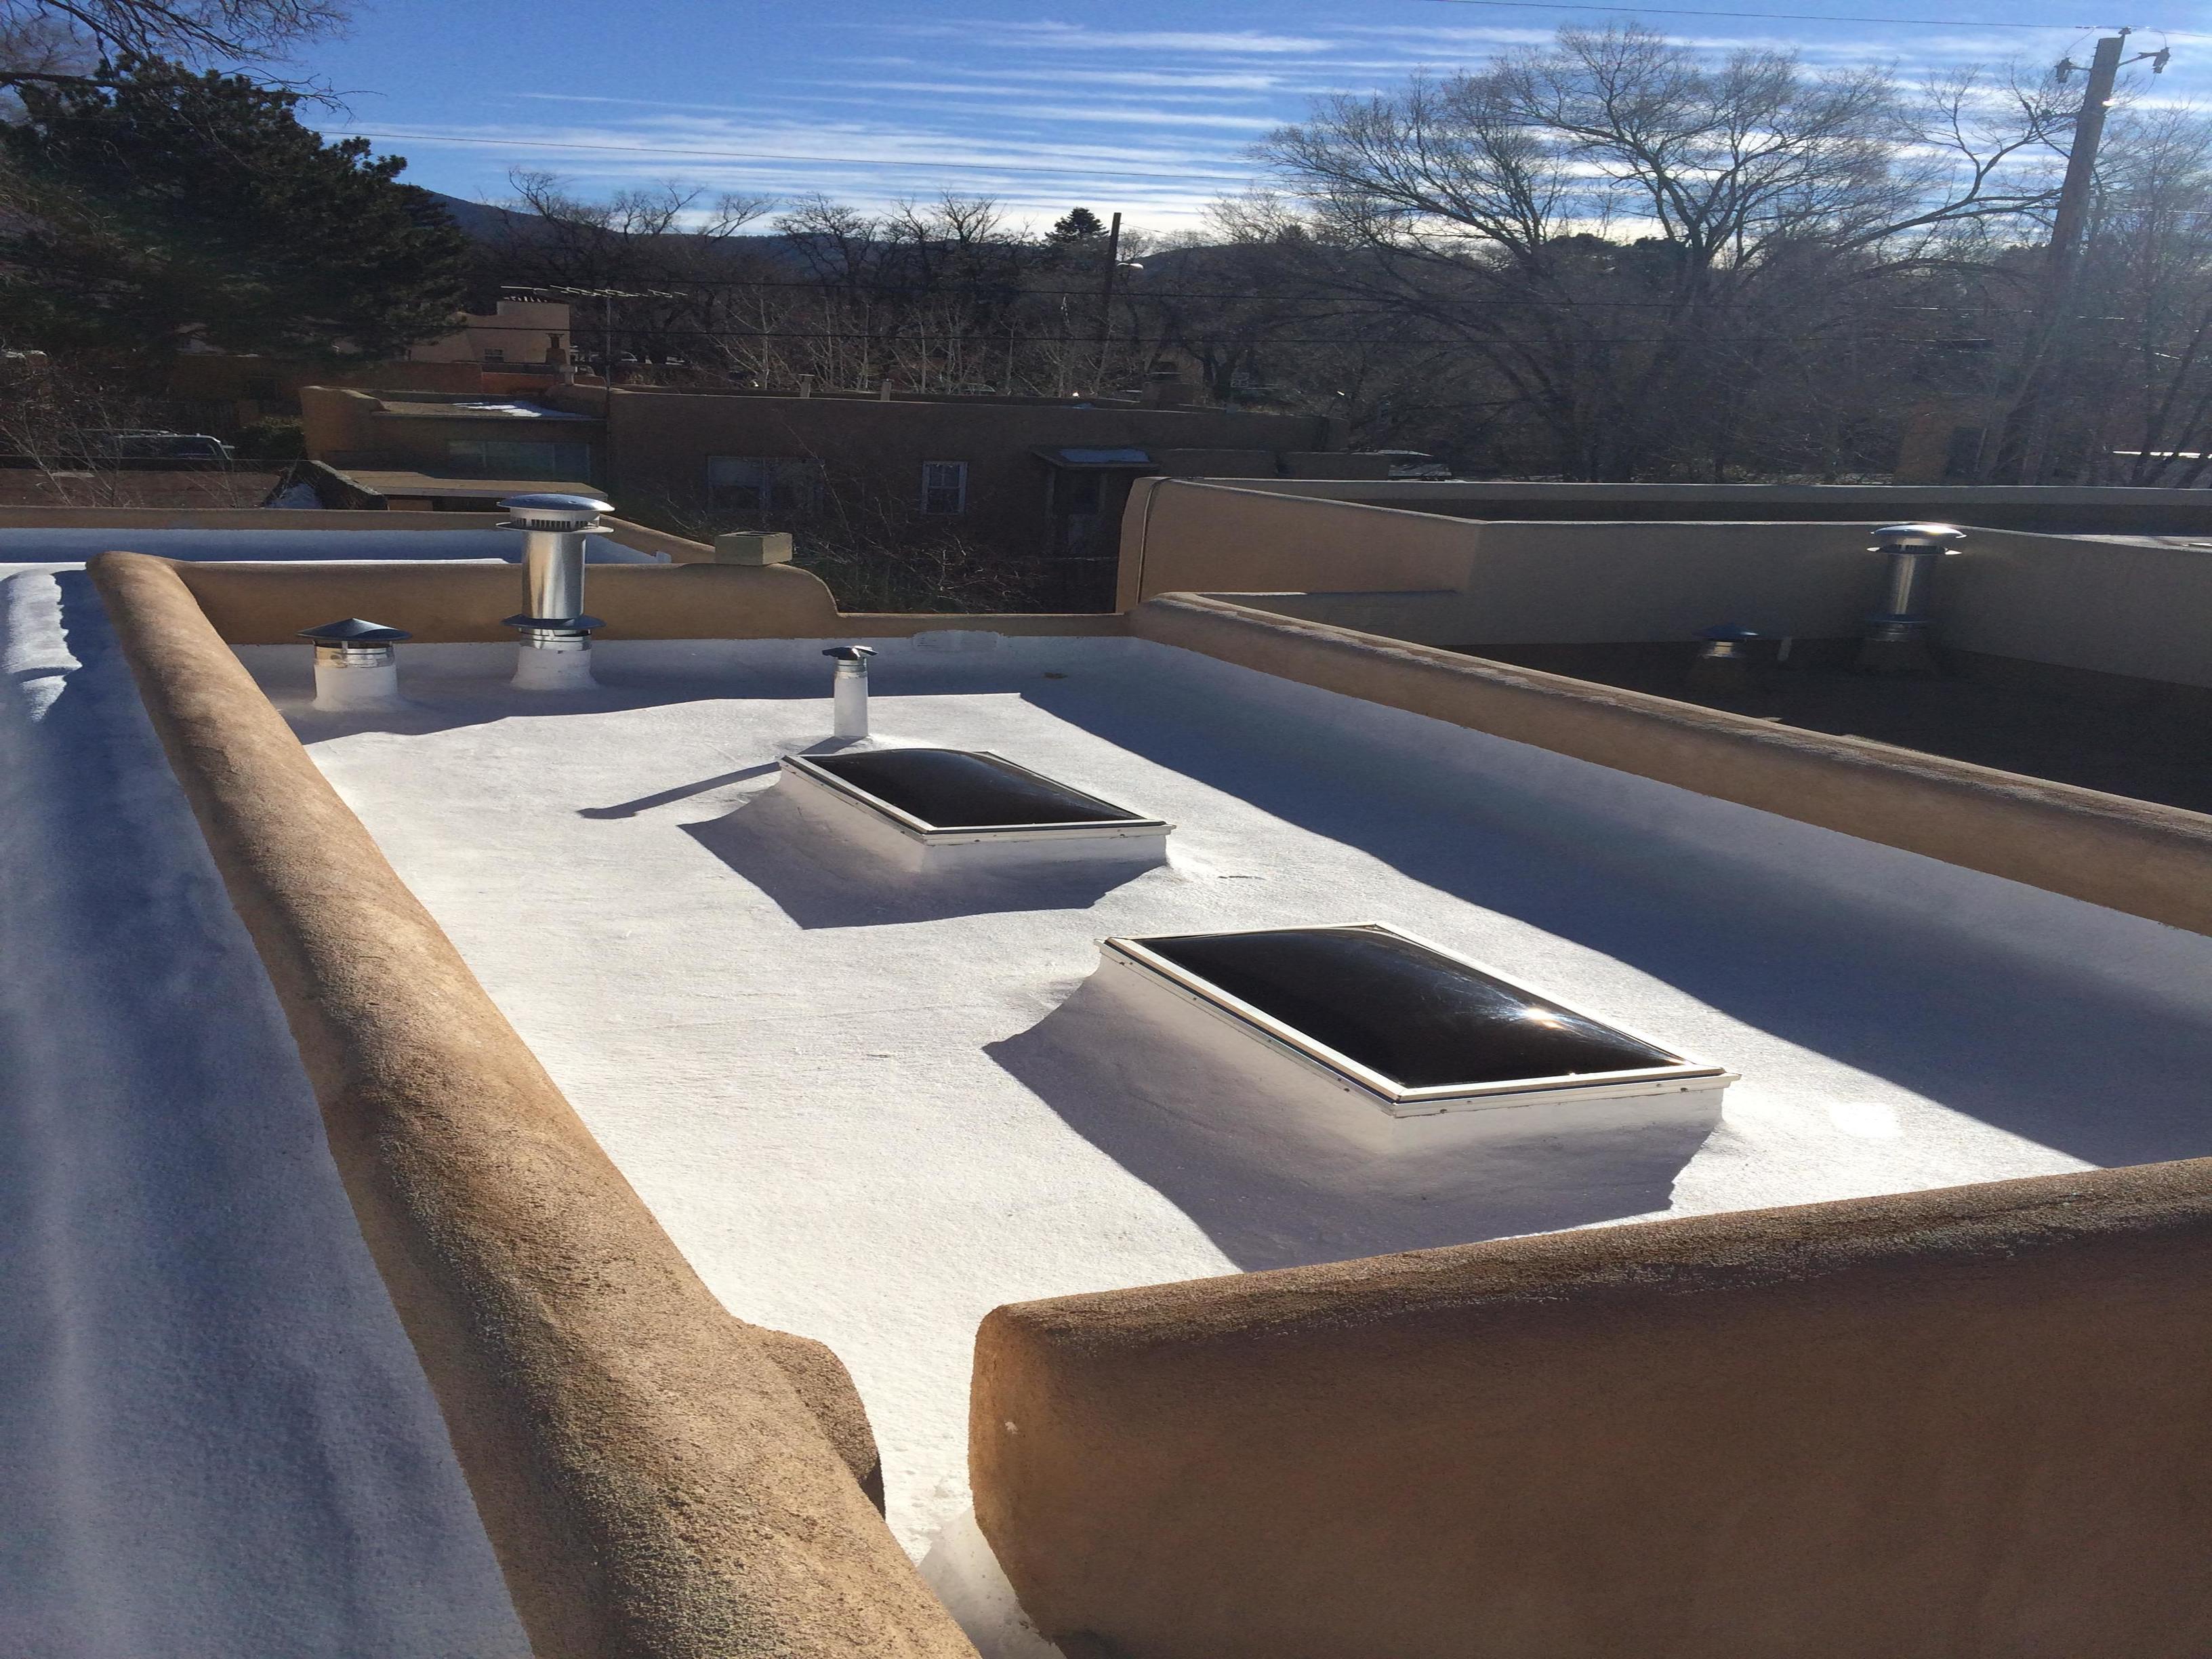 Santa Fe Stucco And Roofing Santa Fe Nm Drywall Contractors